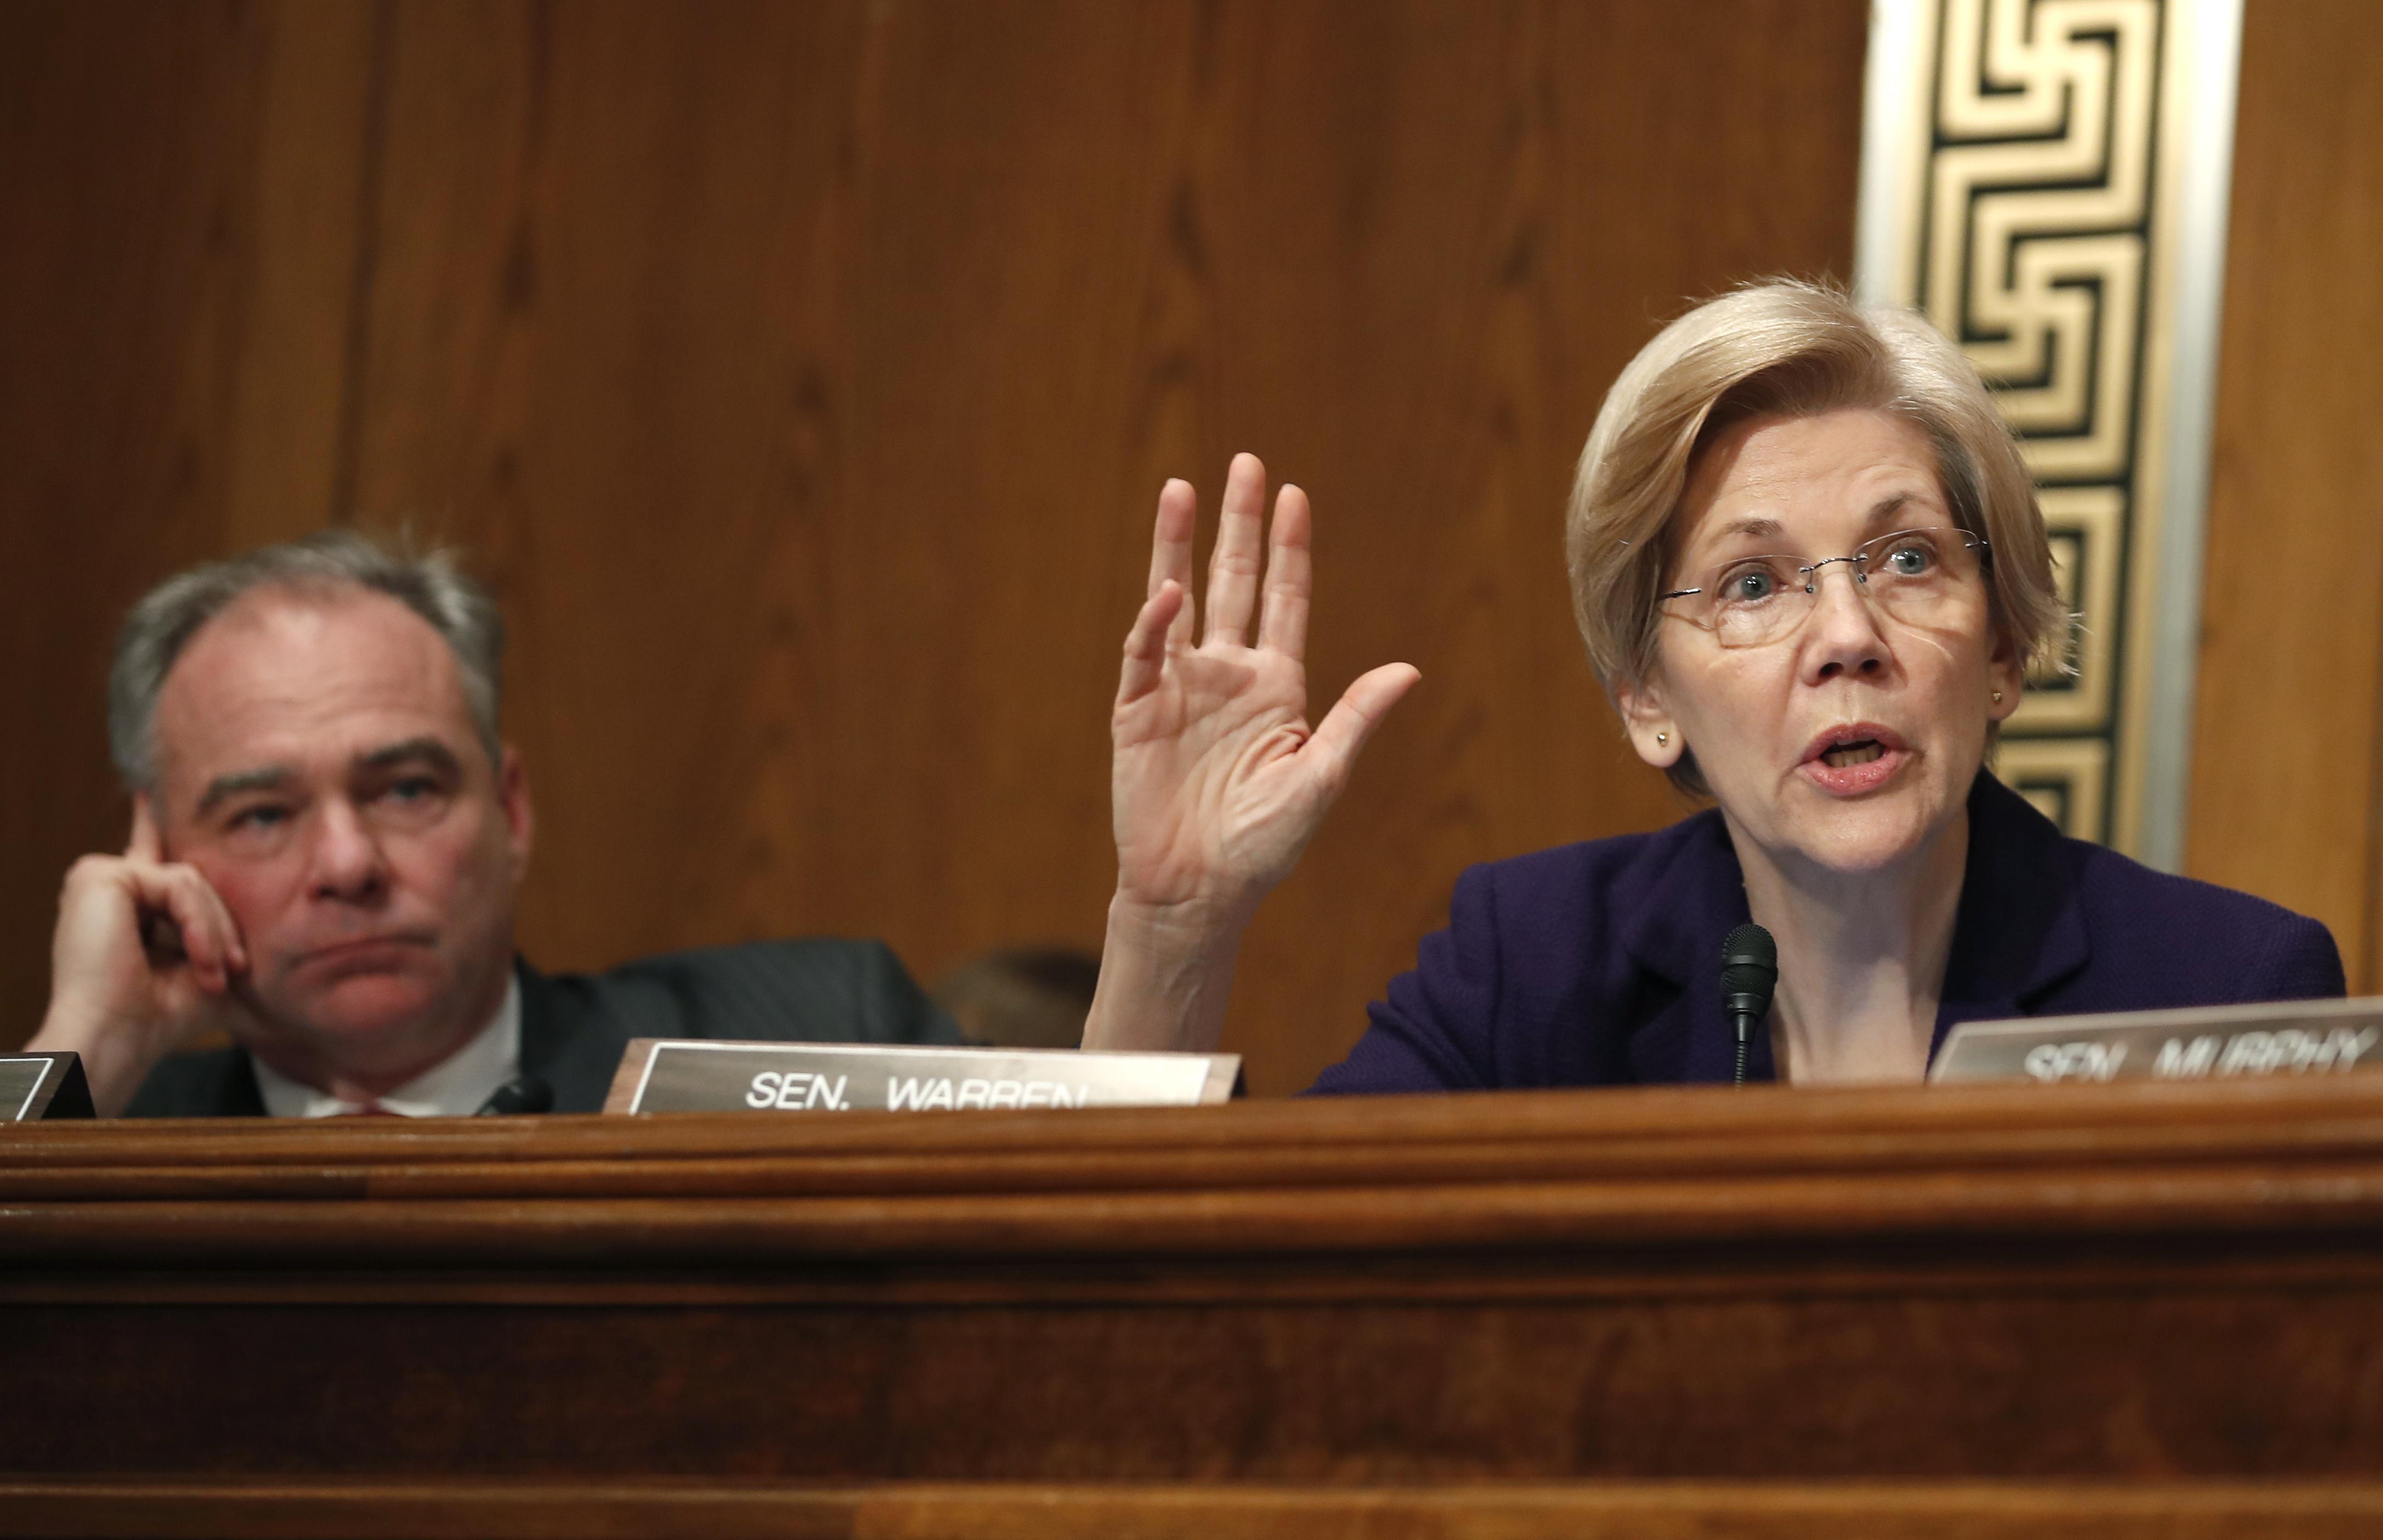 Sen. Elizabeth Warren, D-Mass., questions Education Secretary-designate Betsy DeVos on Capitol Hill in Washington on Jan. 17, 2017. (AP Photo/Carolyn Kaster)